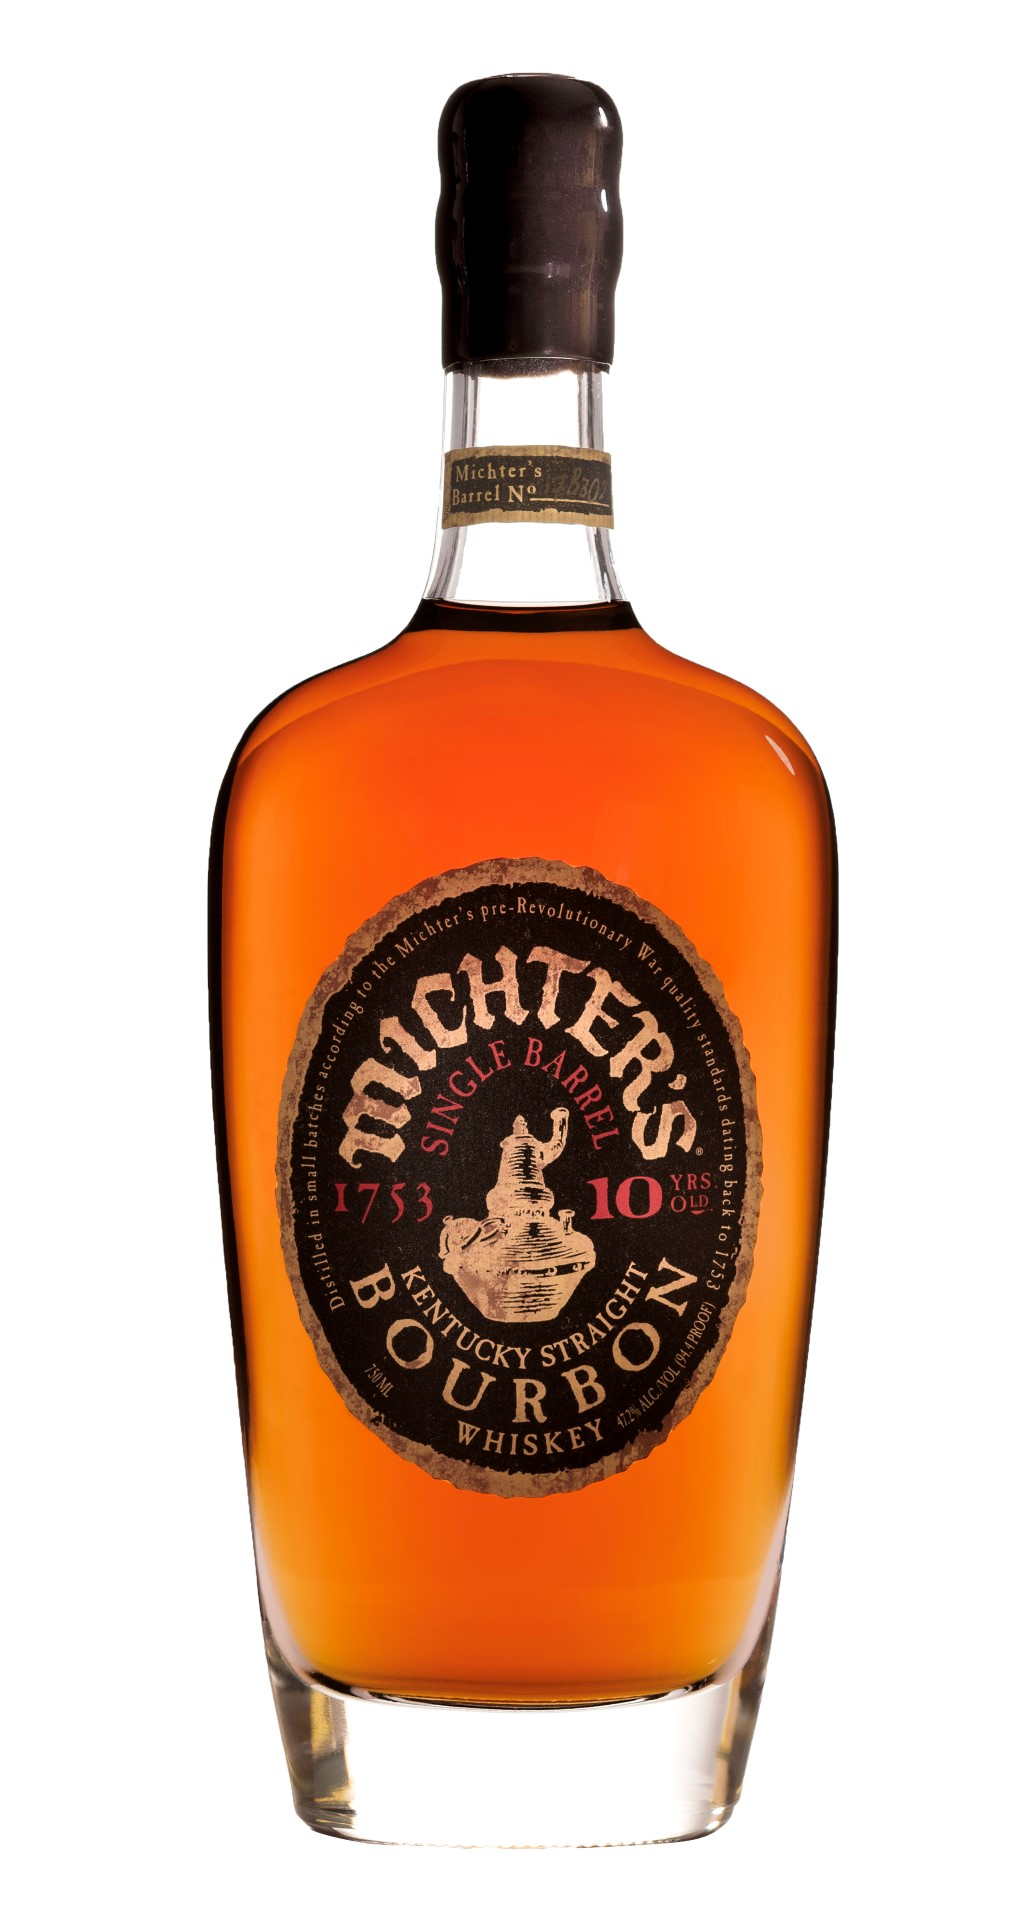 Michter's Single Barrel Bourbon 10 Years Old 2017